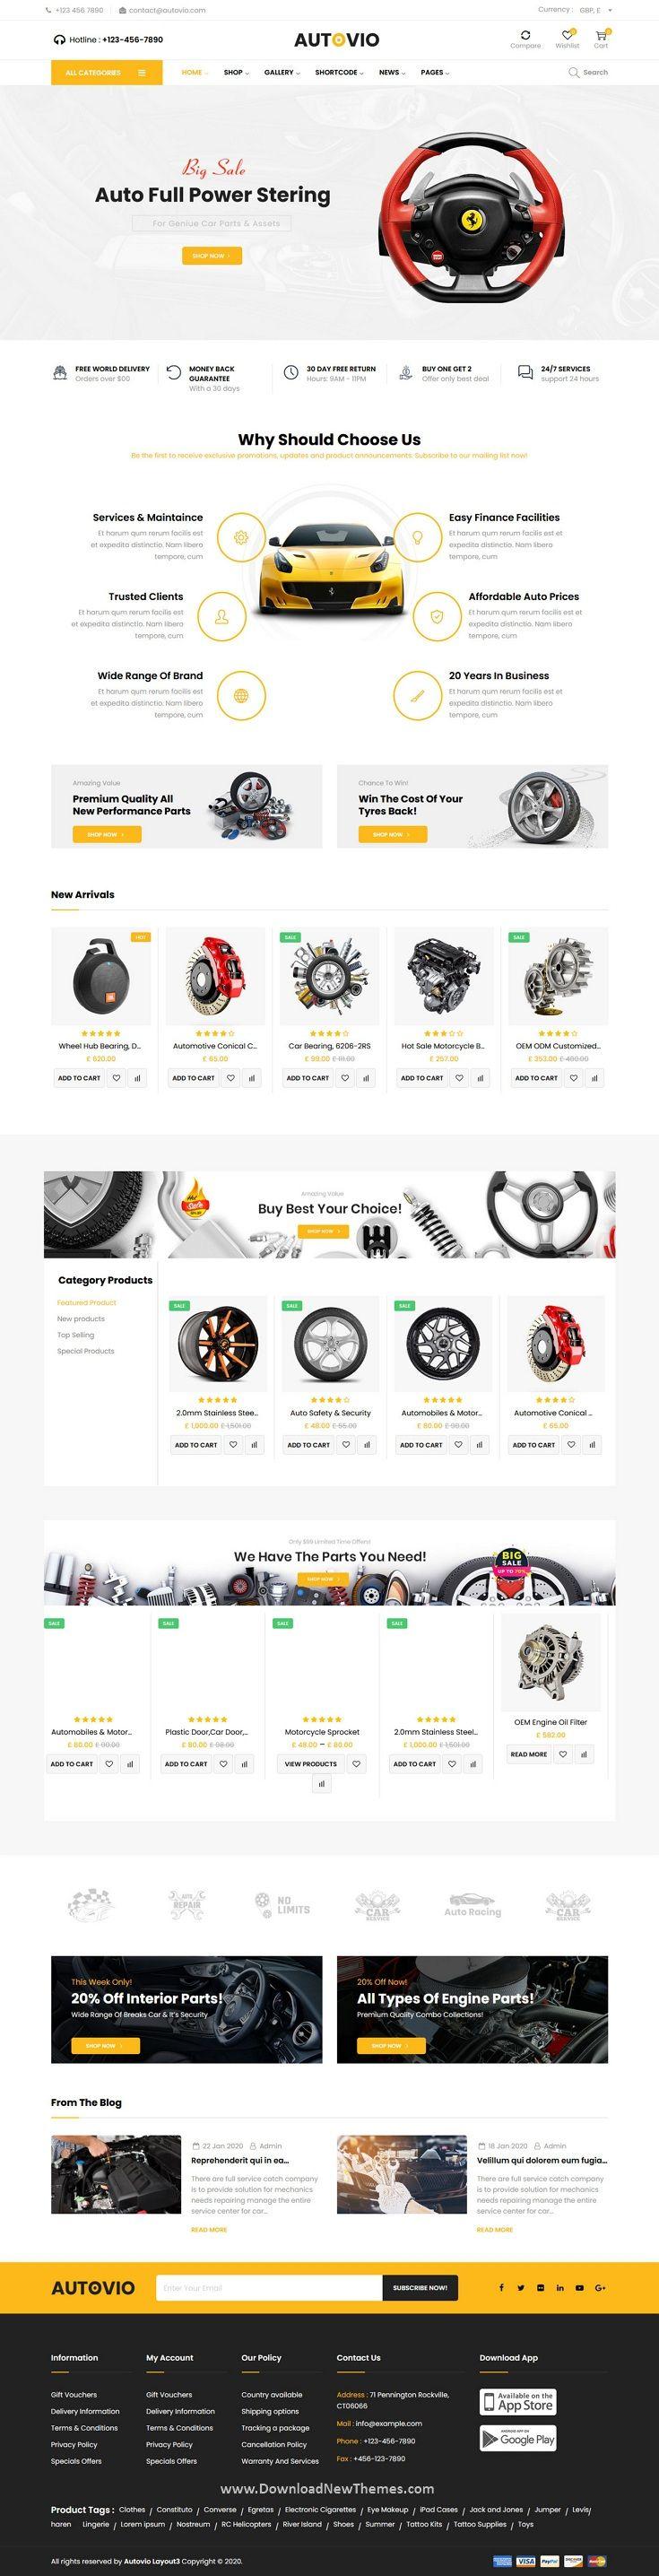 Autovio   Car Accessories WooCommerce Theme   Woocommerce themes ...